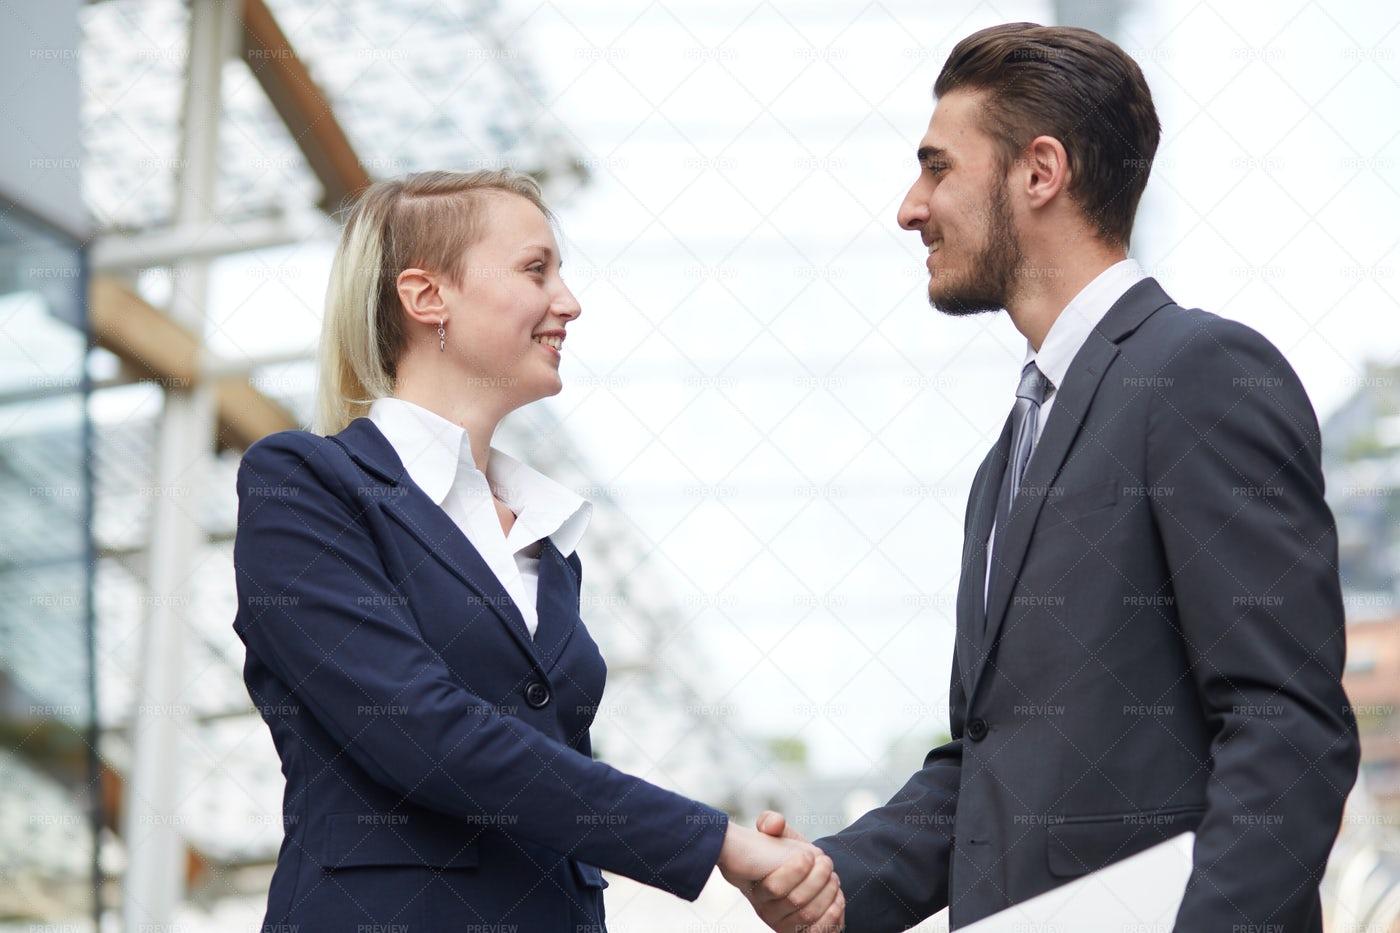 Handshake During A Meeting: Stock Photos